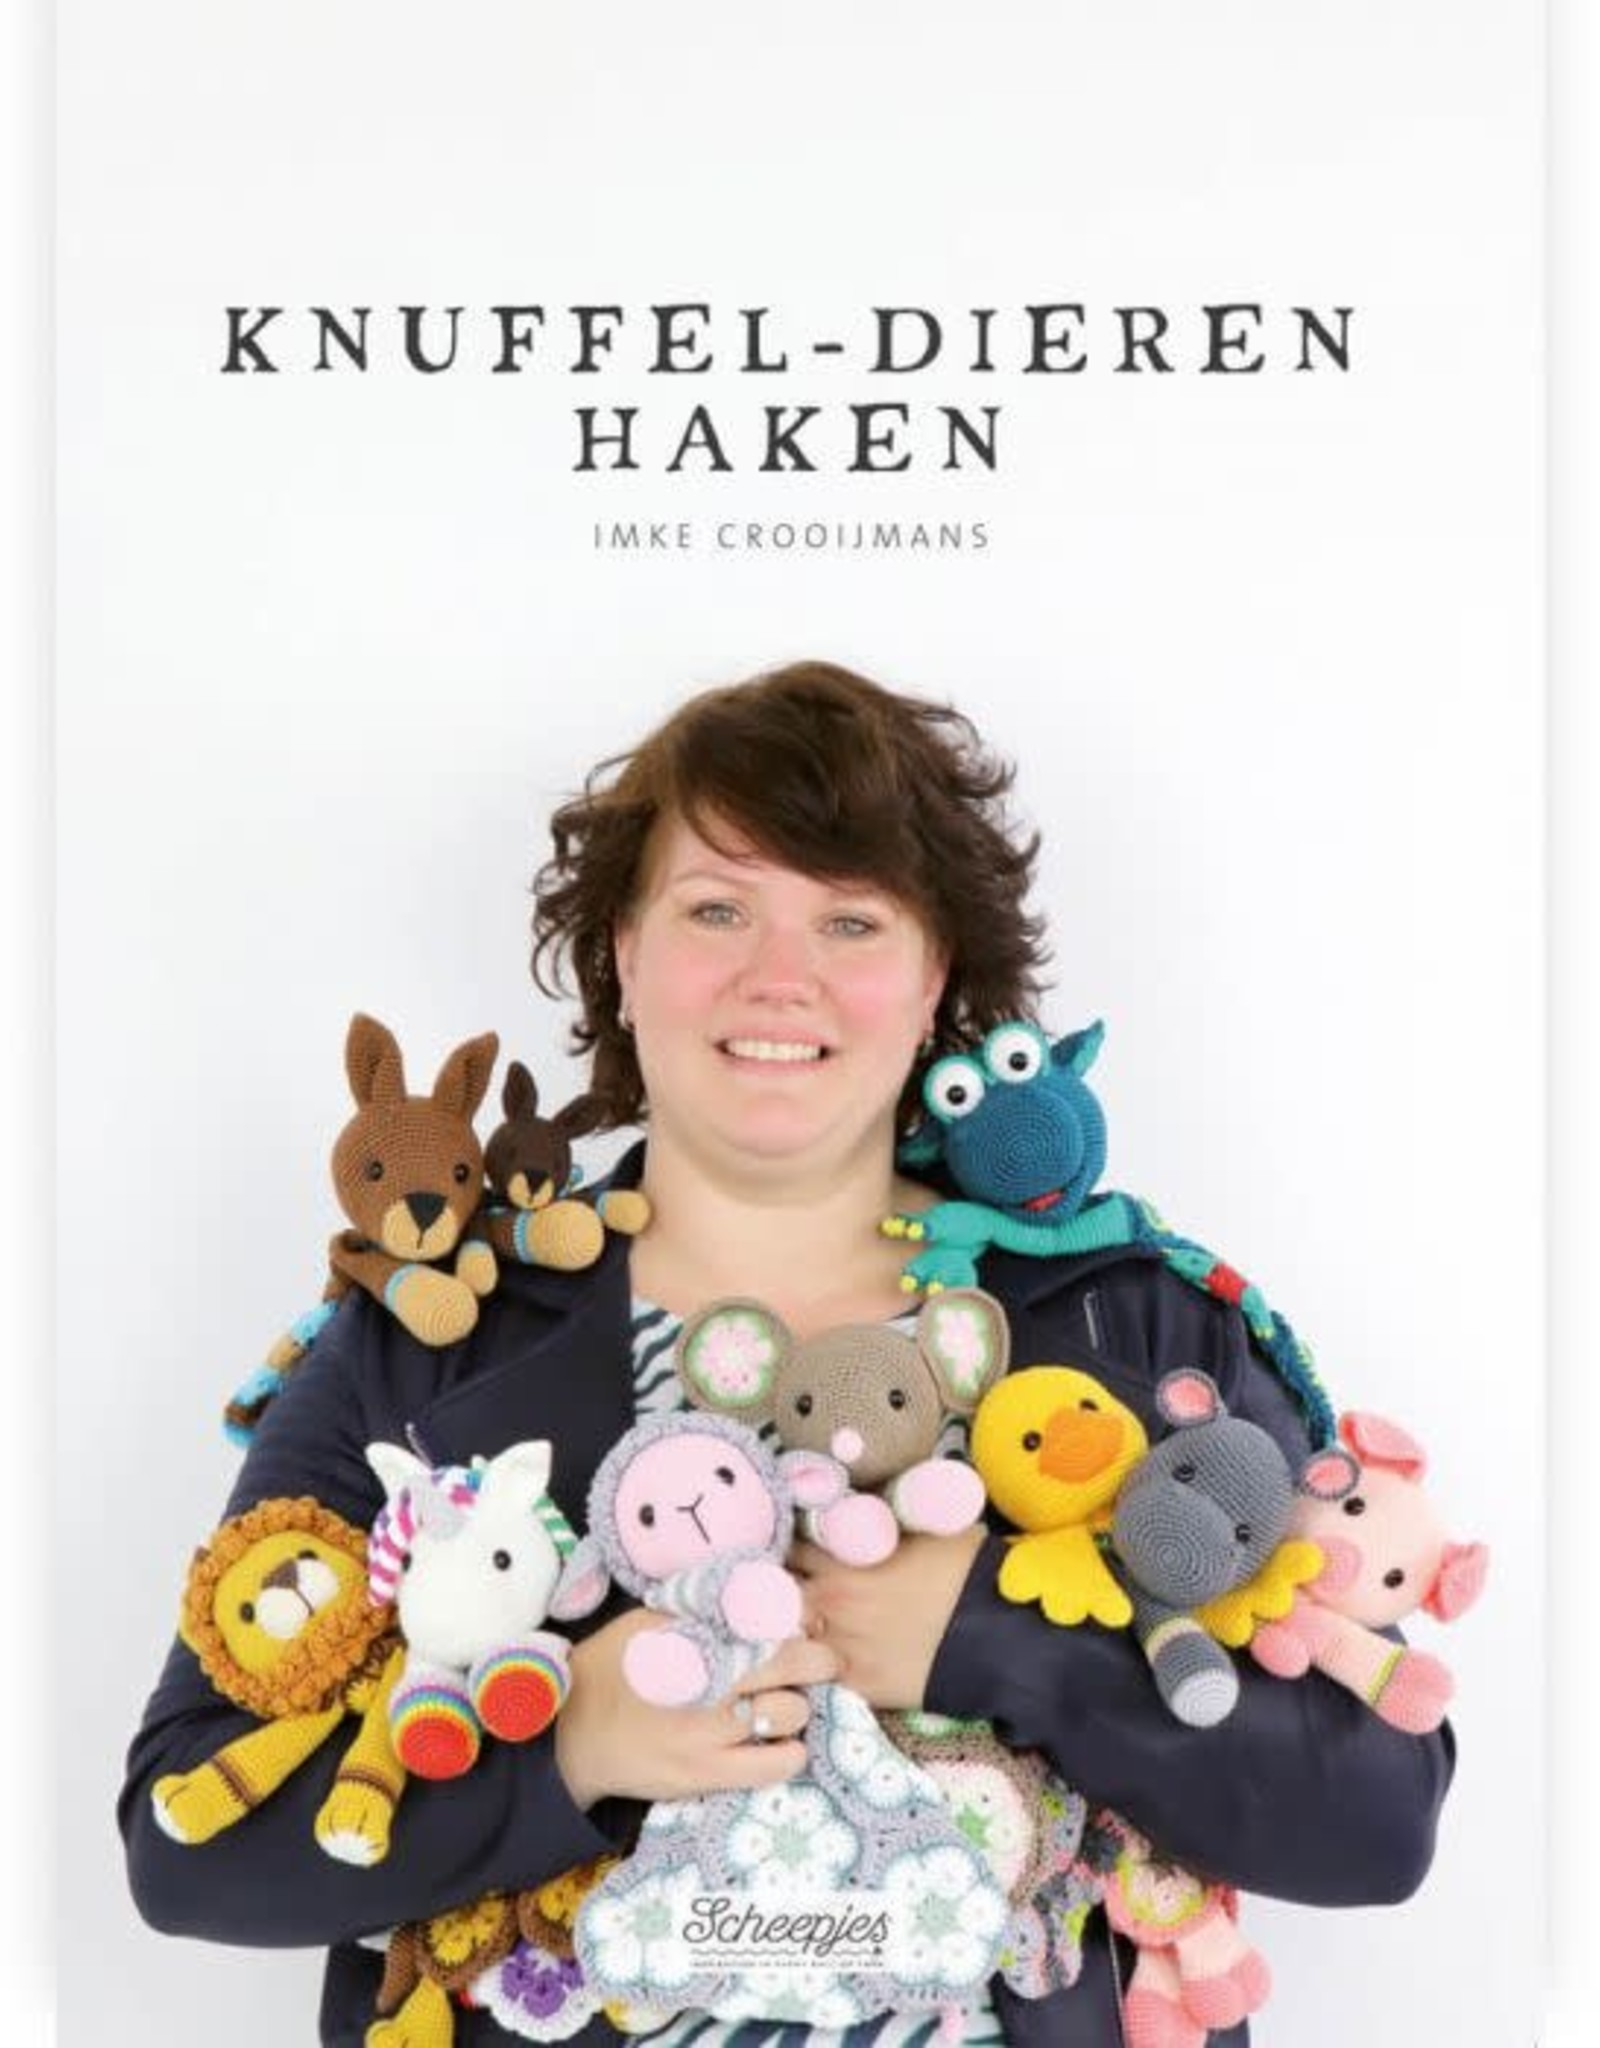 Knuffeldieren haken Auteur Imke Cooijmans